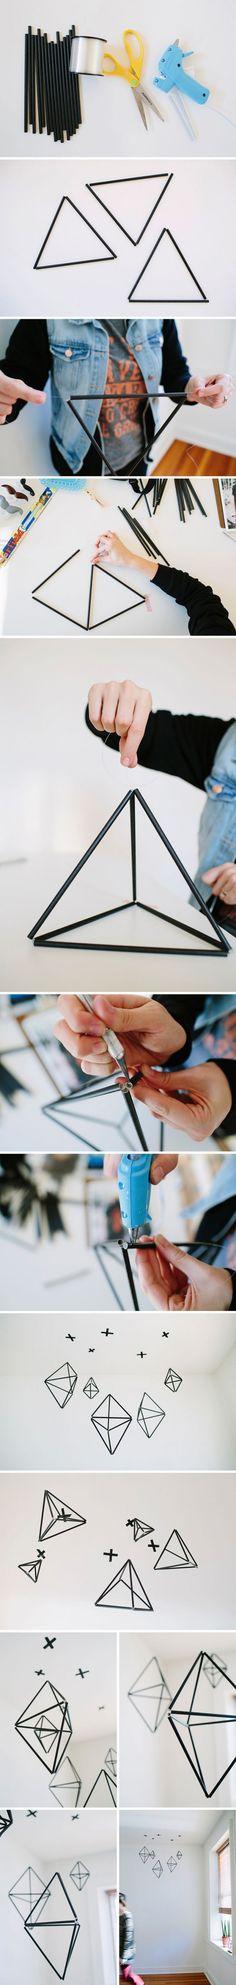 DIY --> Geometric Straw Mobile                                                                             Source